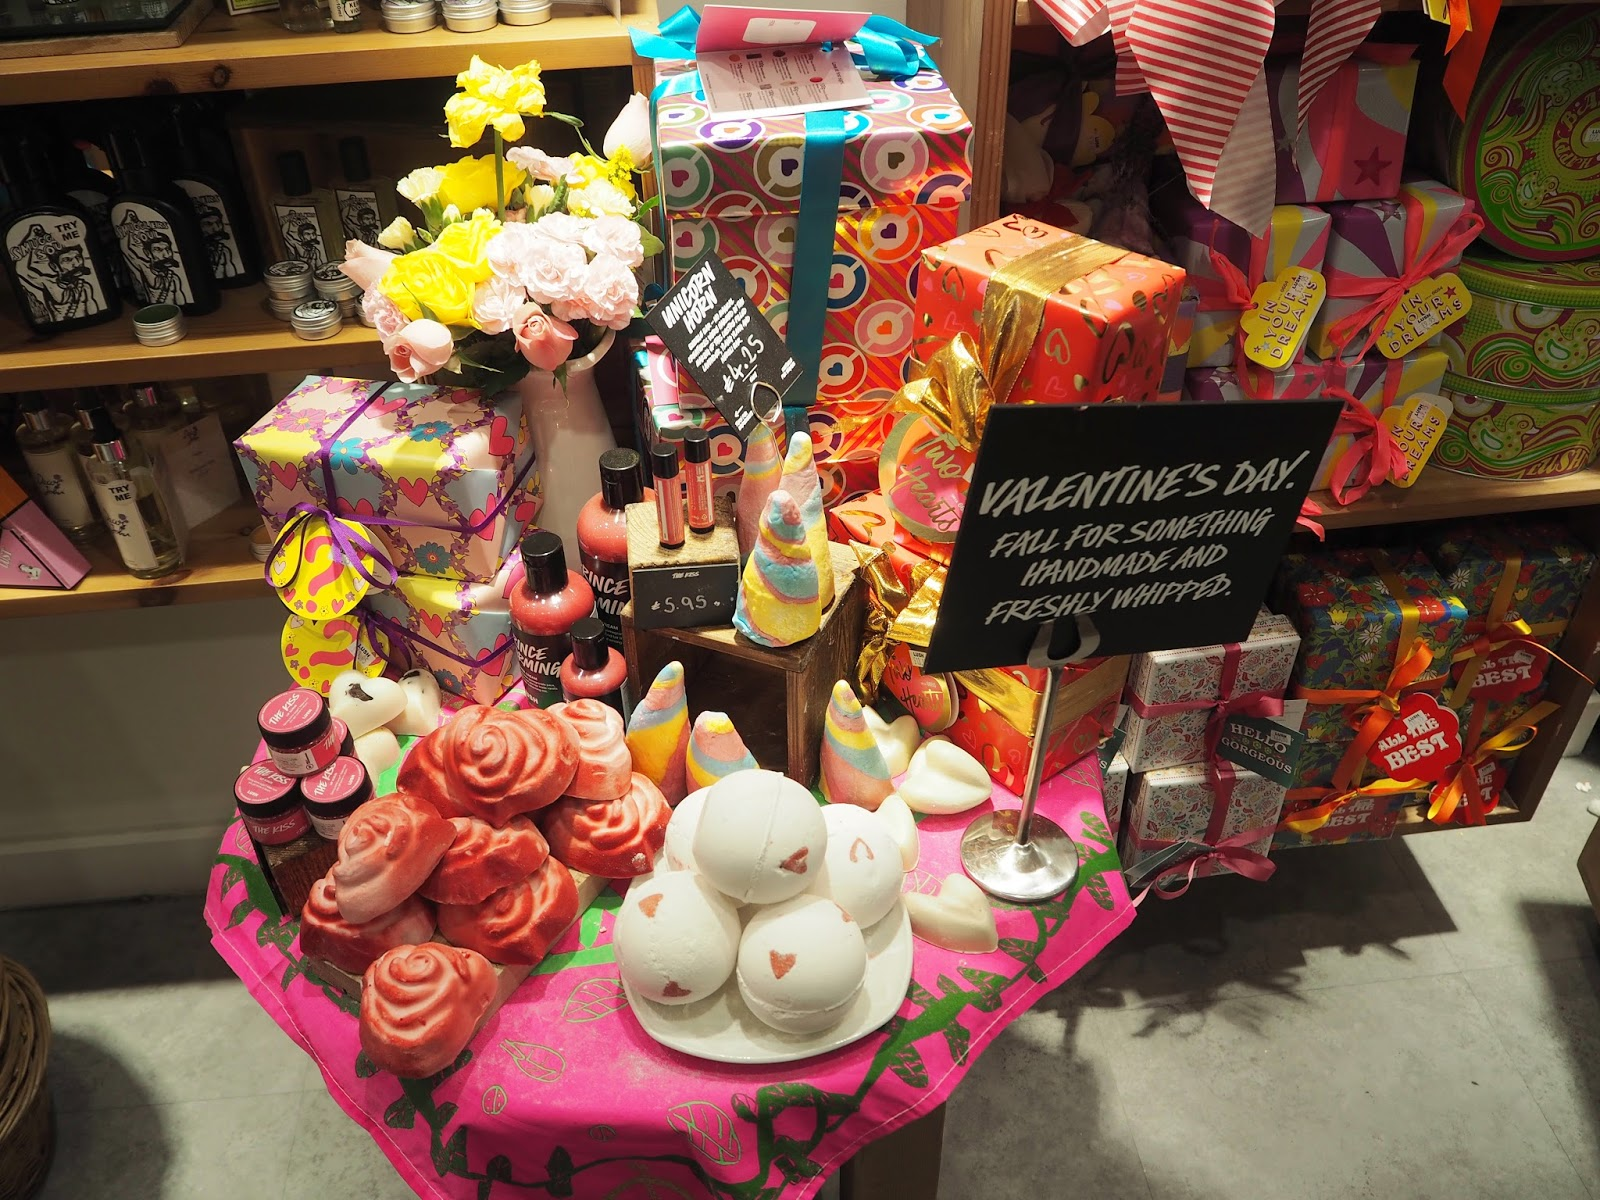 Lush Valentine's Day Collection | Katie Kirk Loves